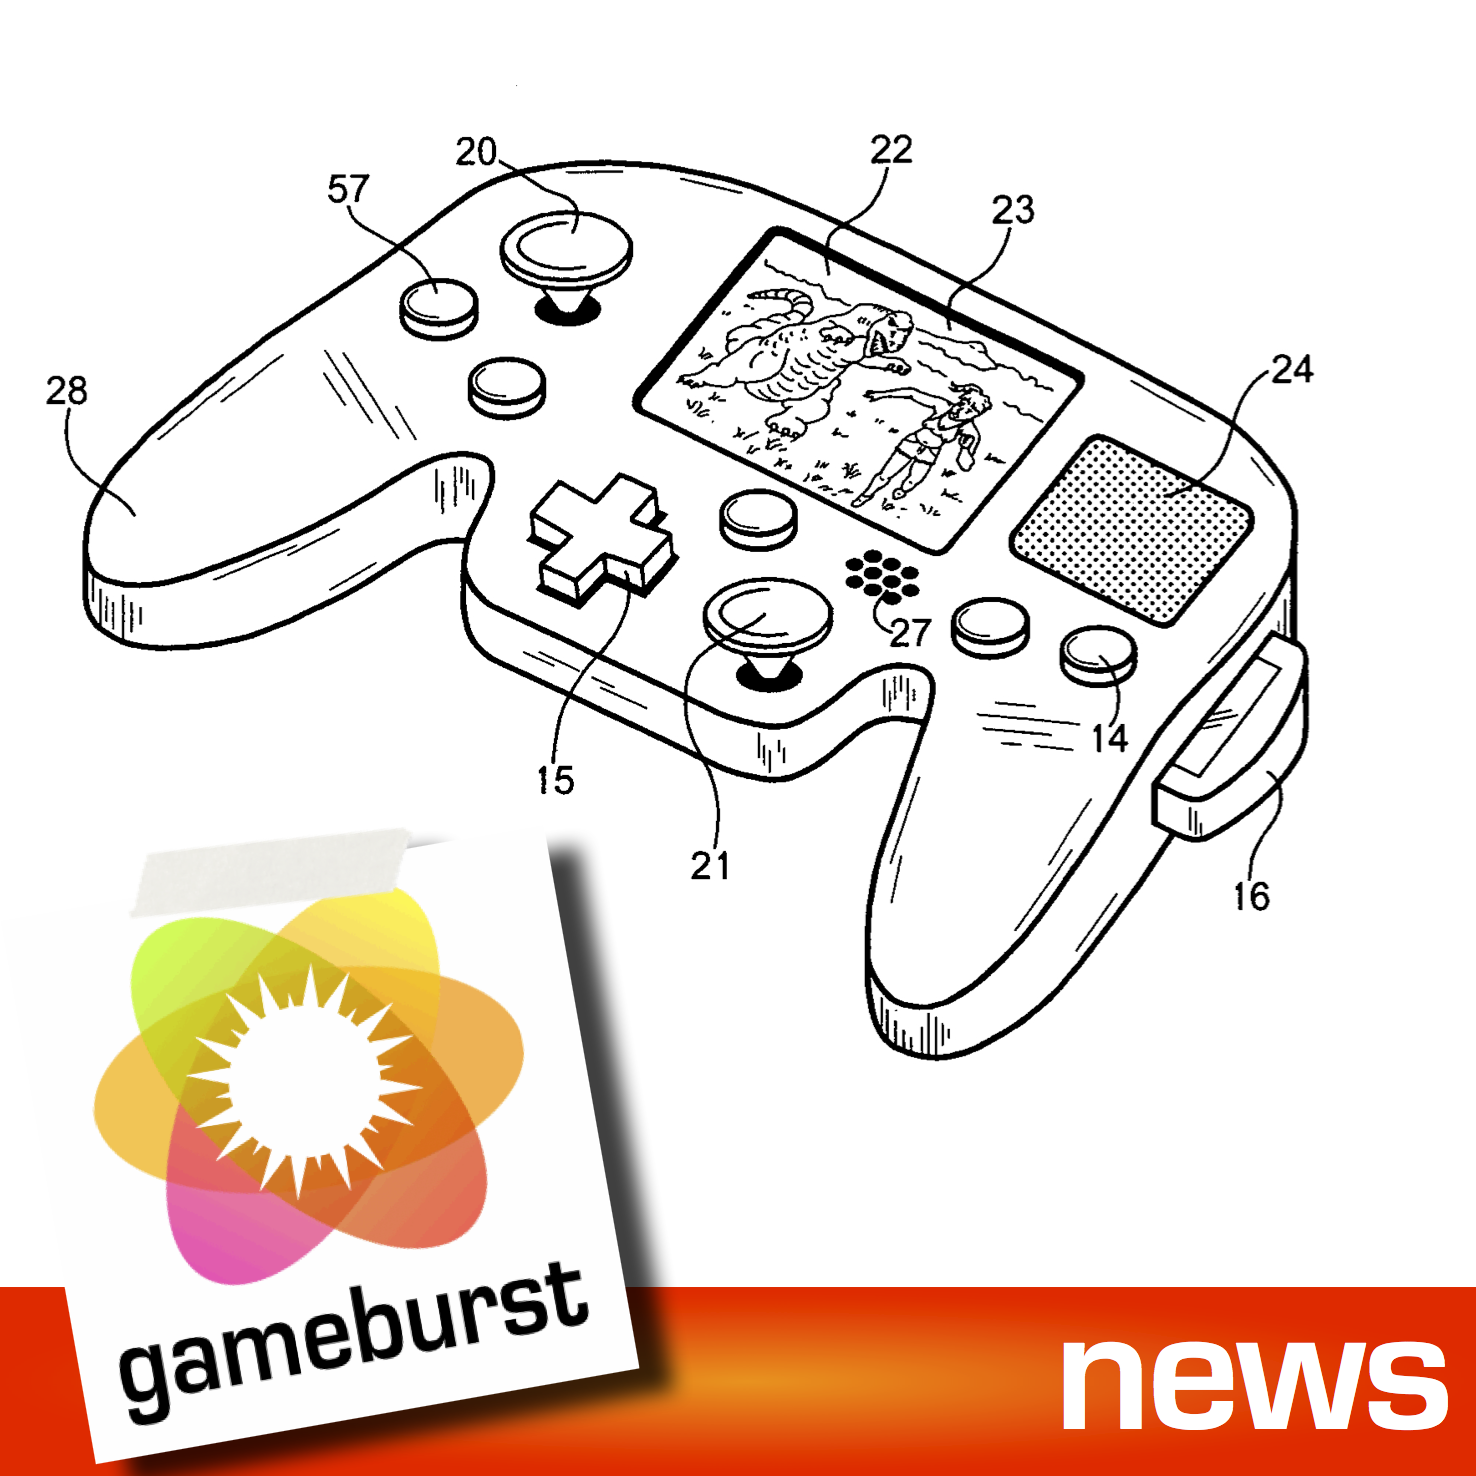 GameBurst News - August 19th, 2012